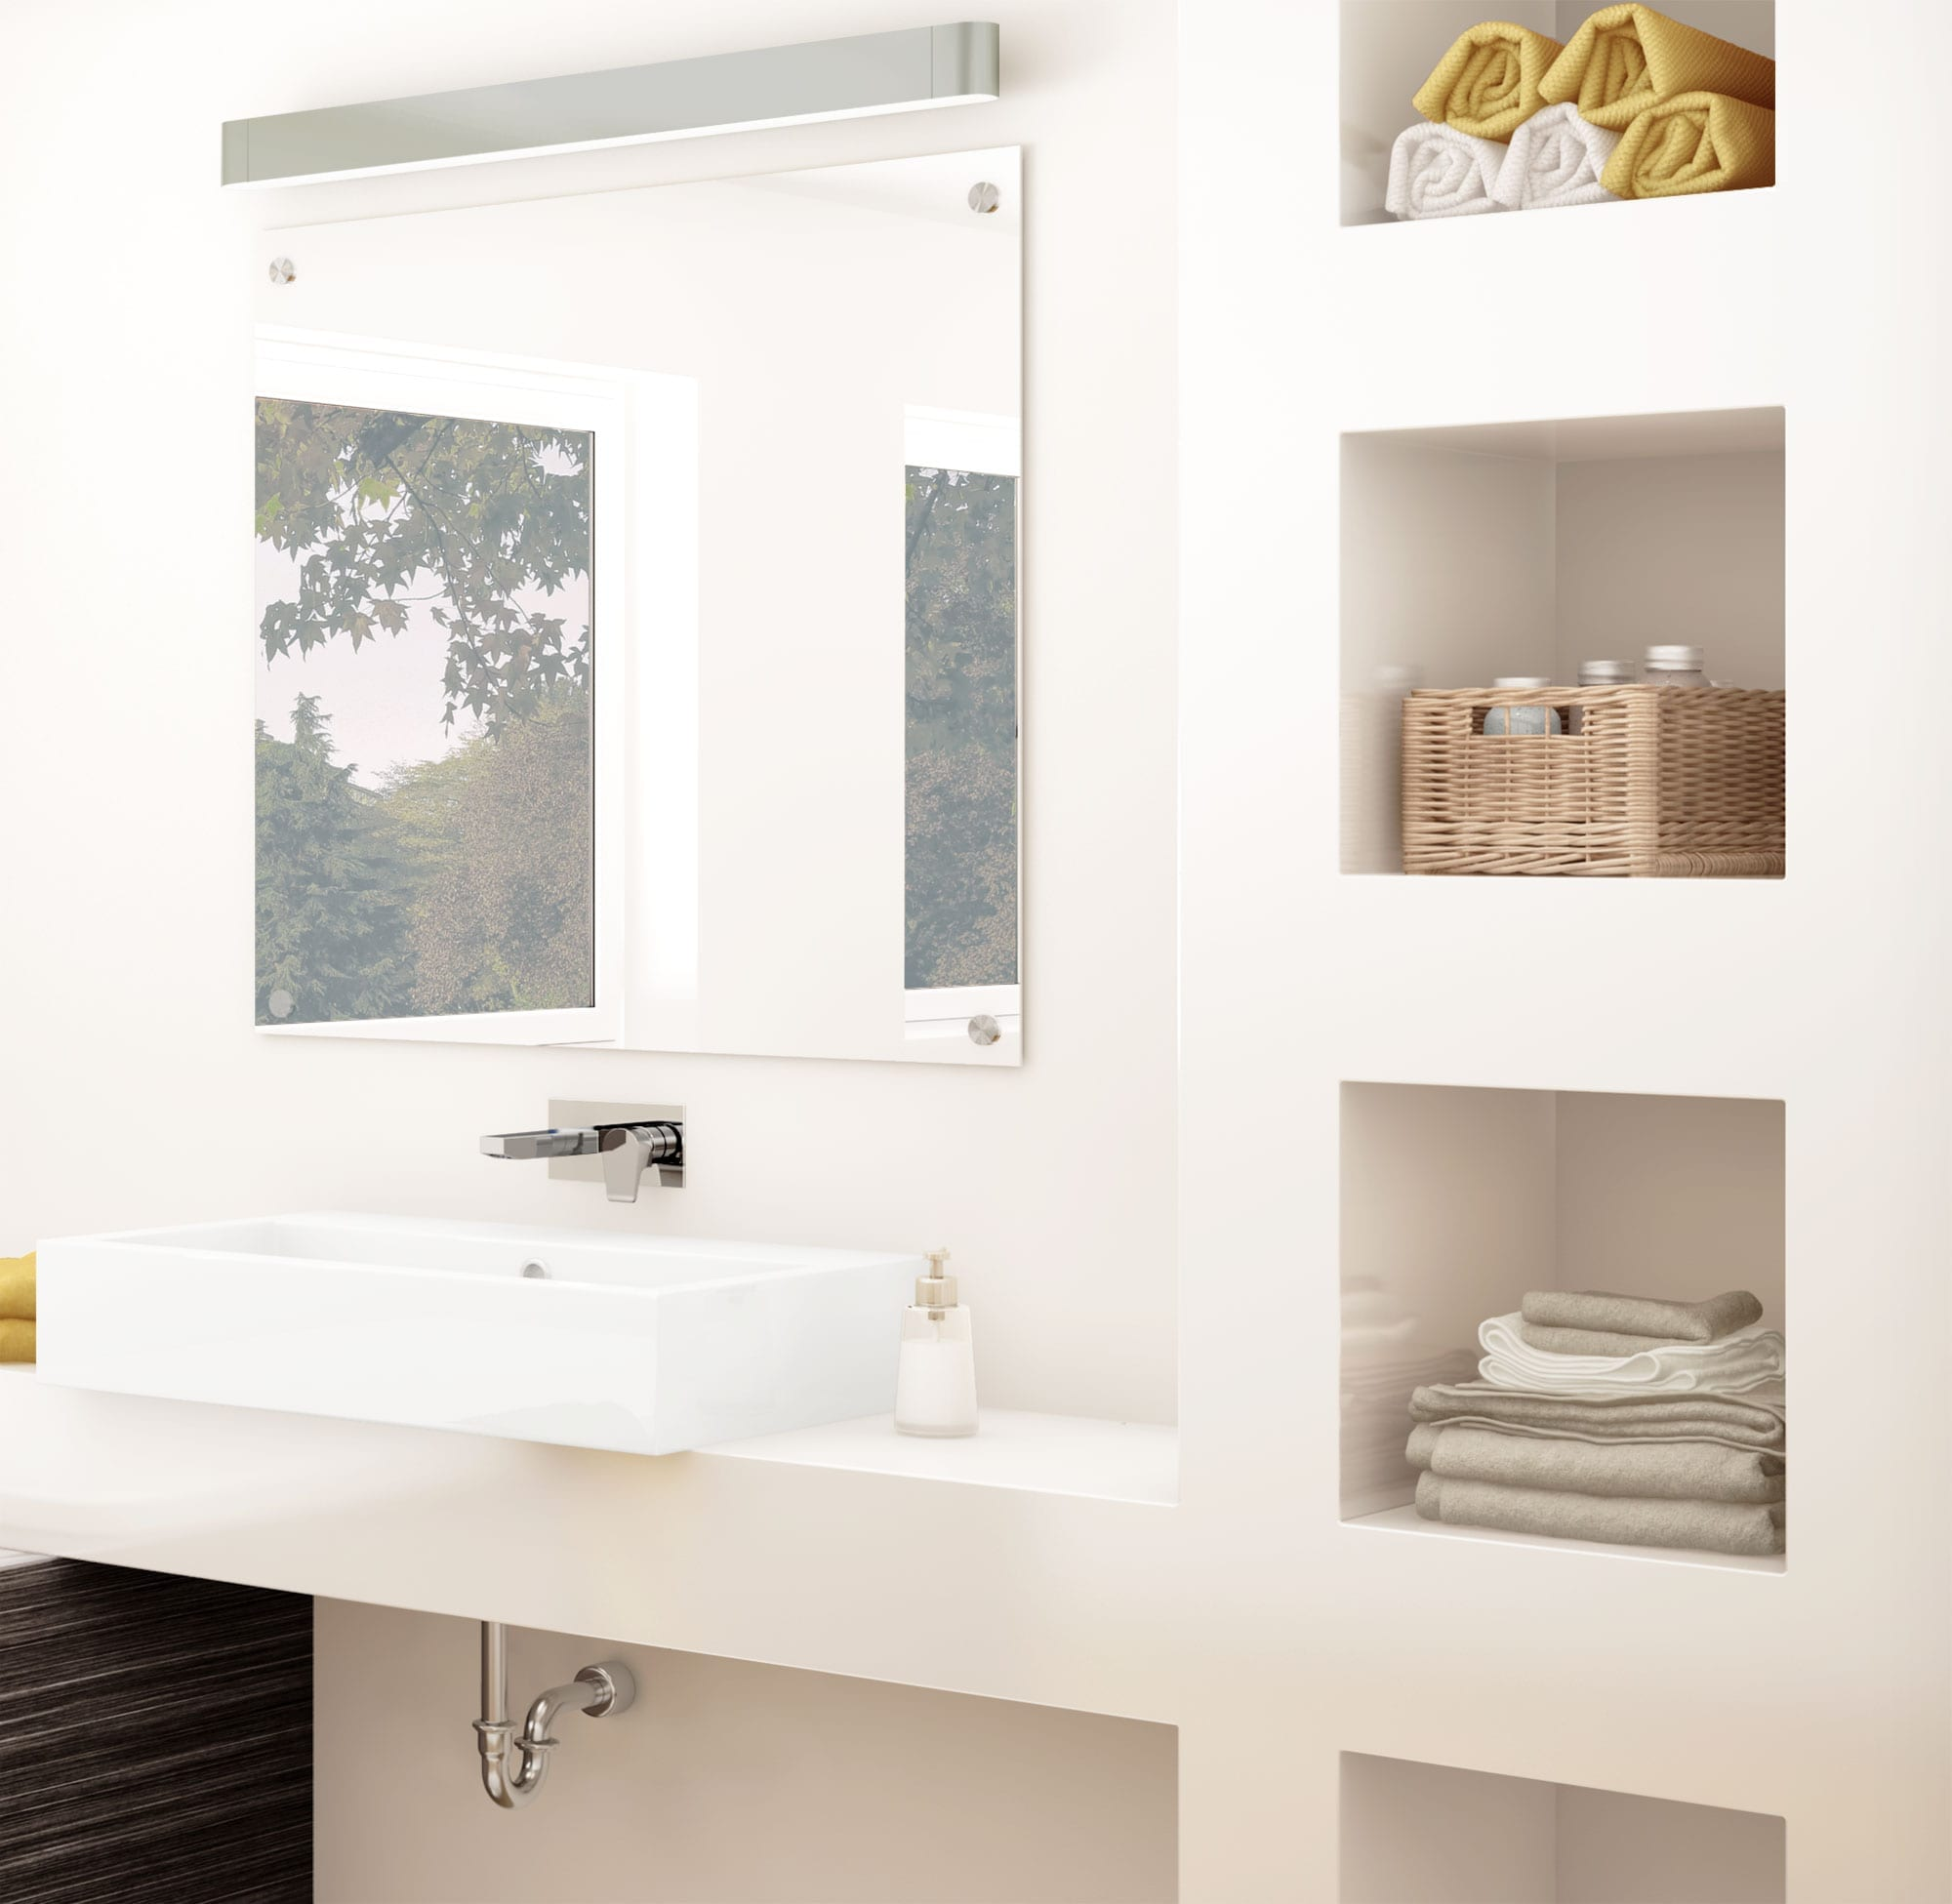 Lavatory Sink Faucet Wall Mount Installation B 233 Langer Upt